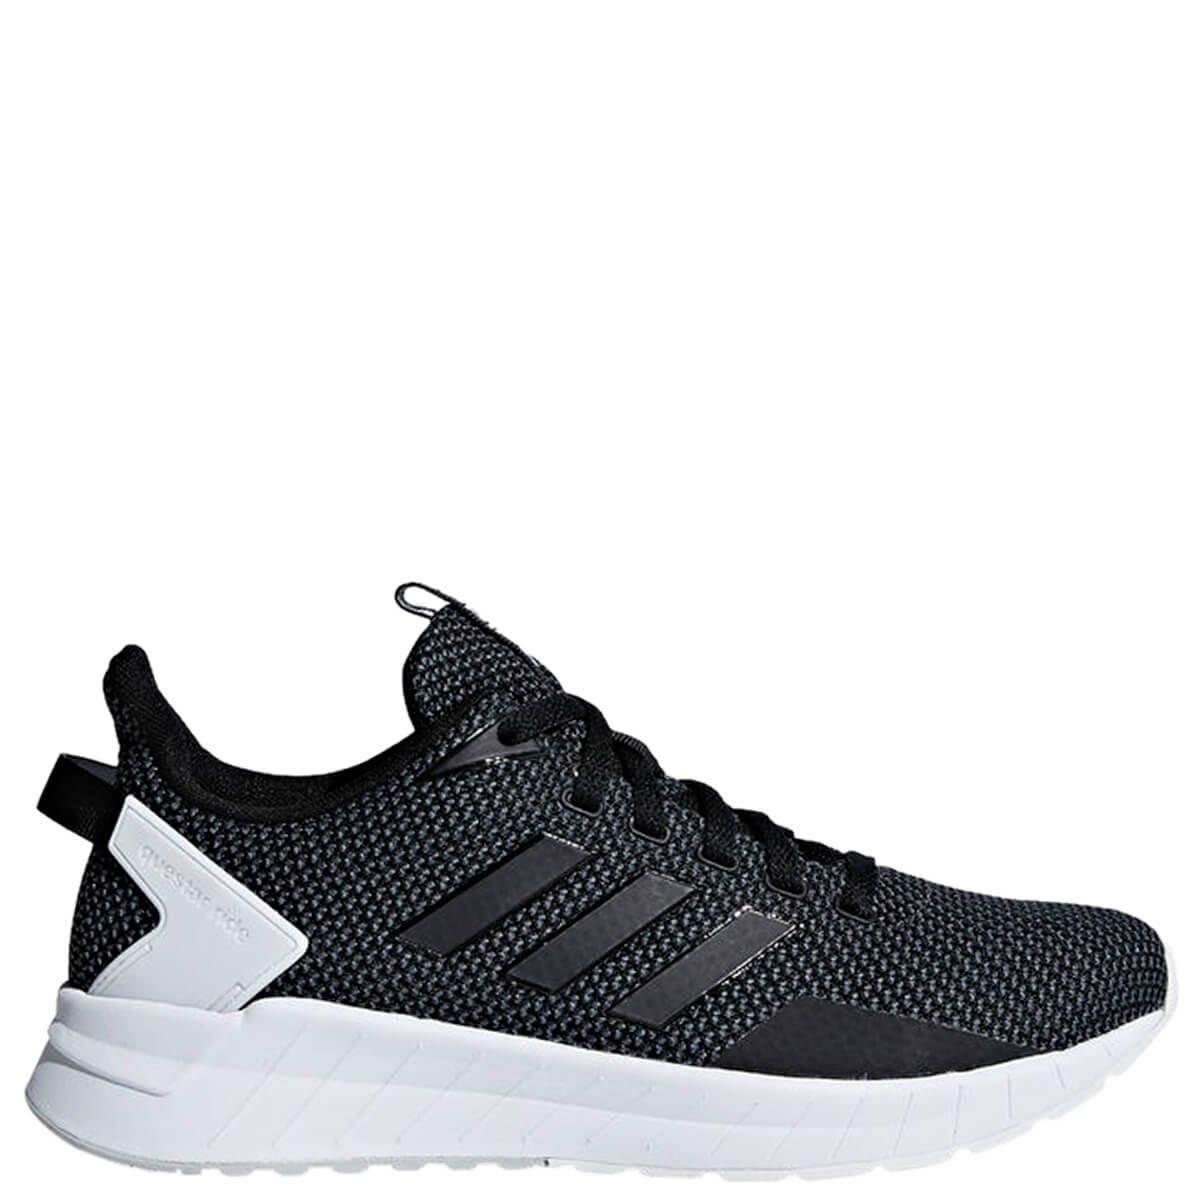 7c86f627074 Bizz Store - Tênis Feminino Adidas Questar Ride Corrida